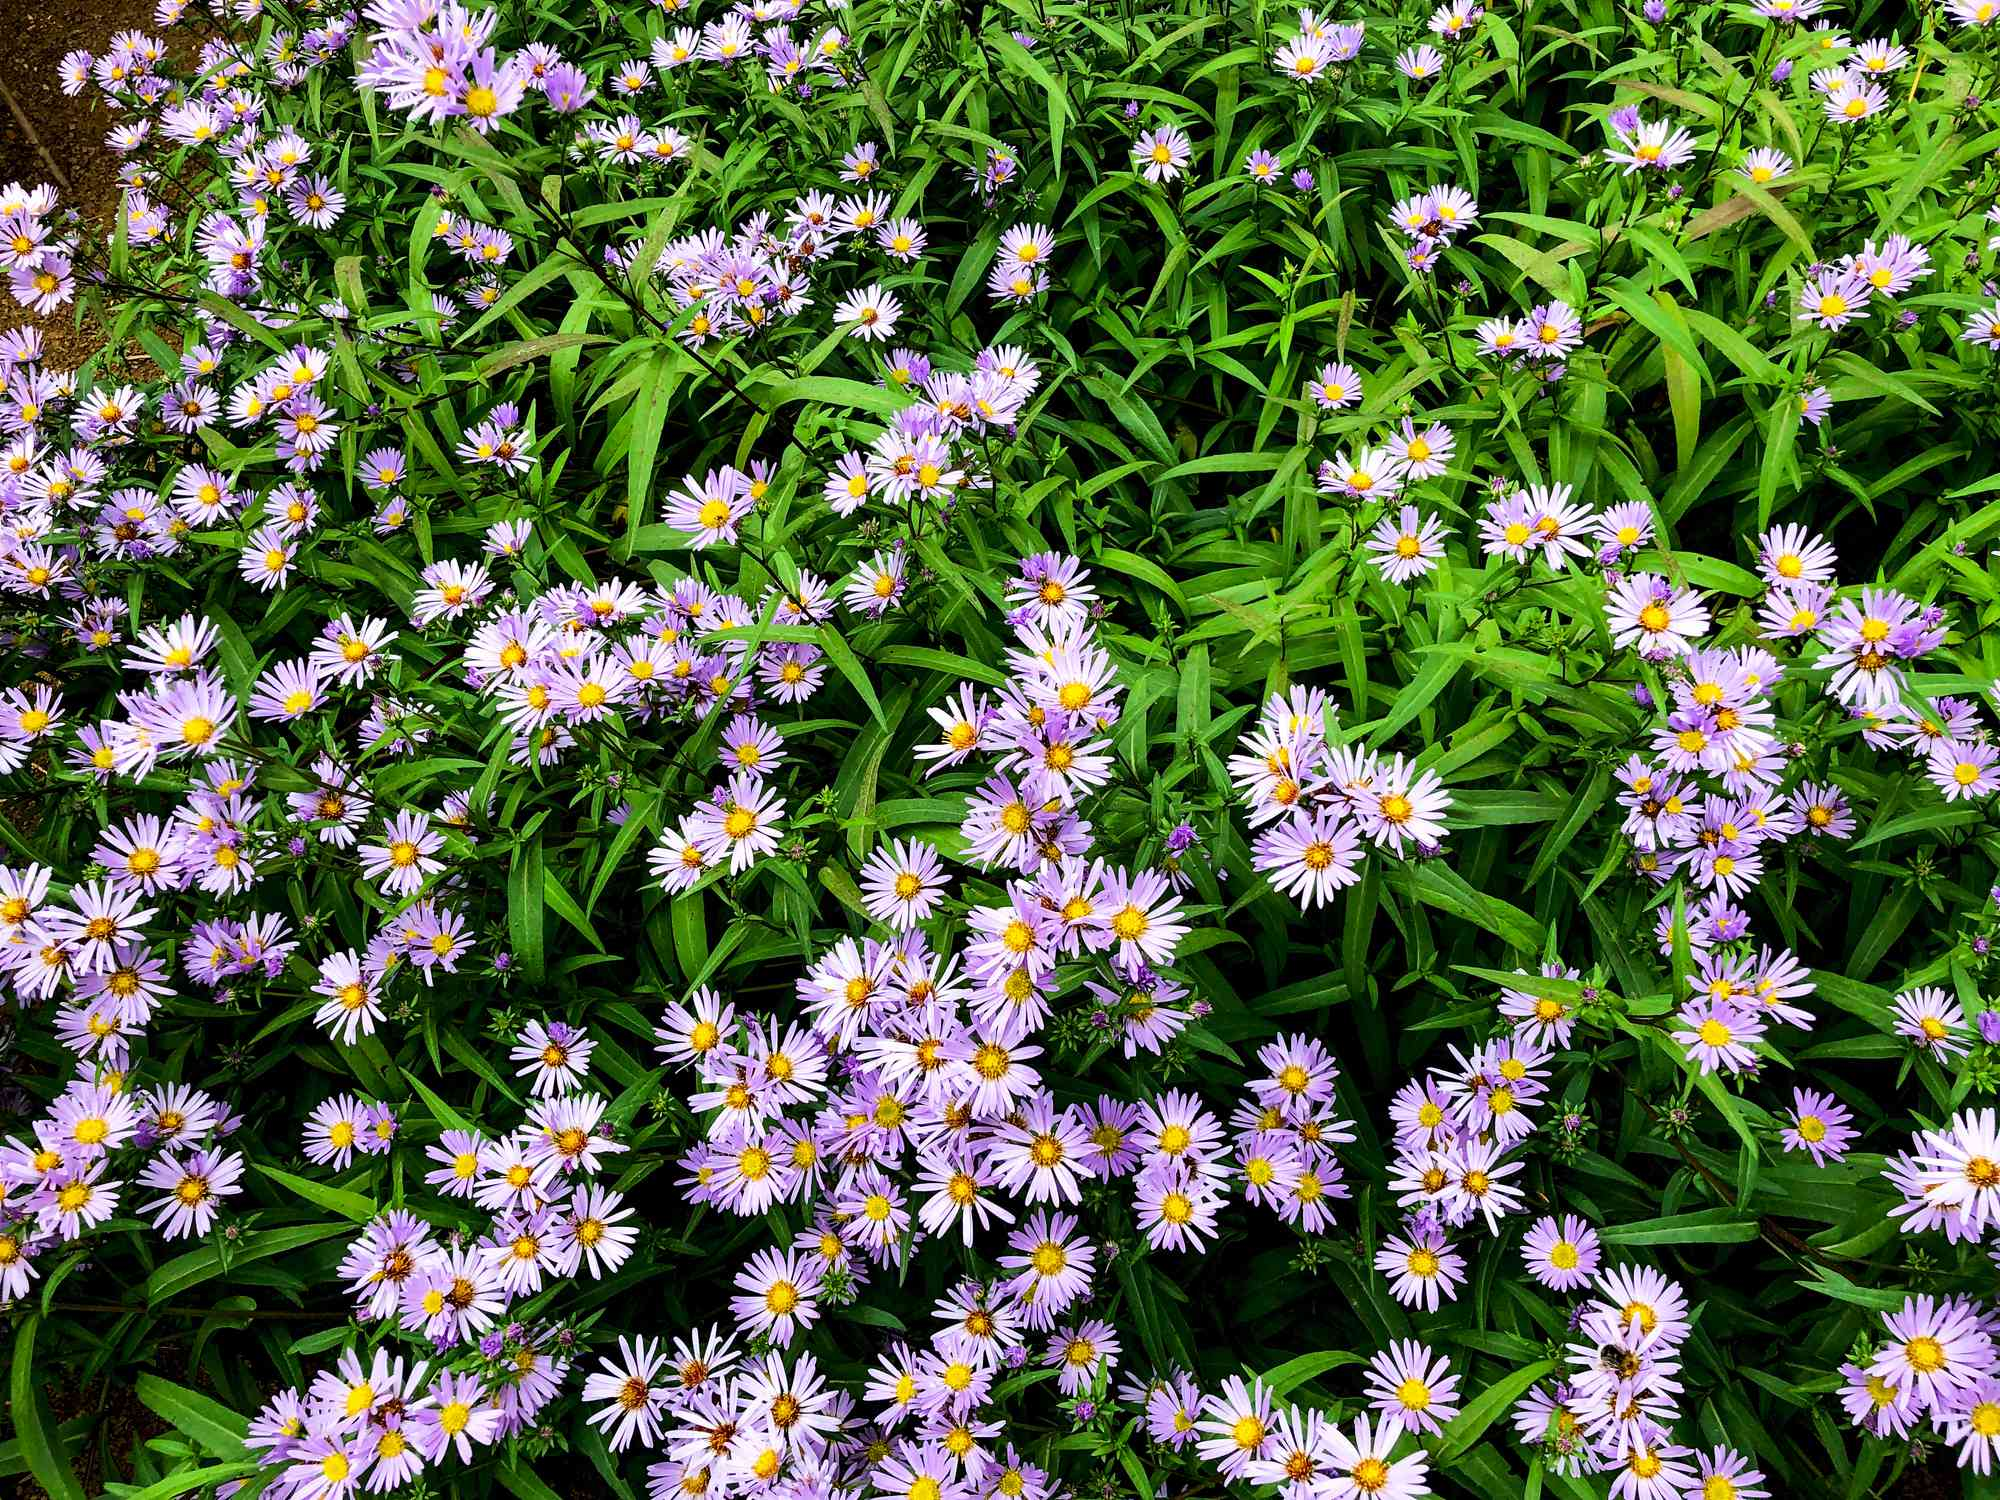 Symphyotrichum novae-angliae flowers in Bloom